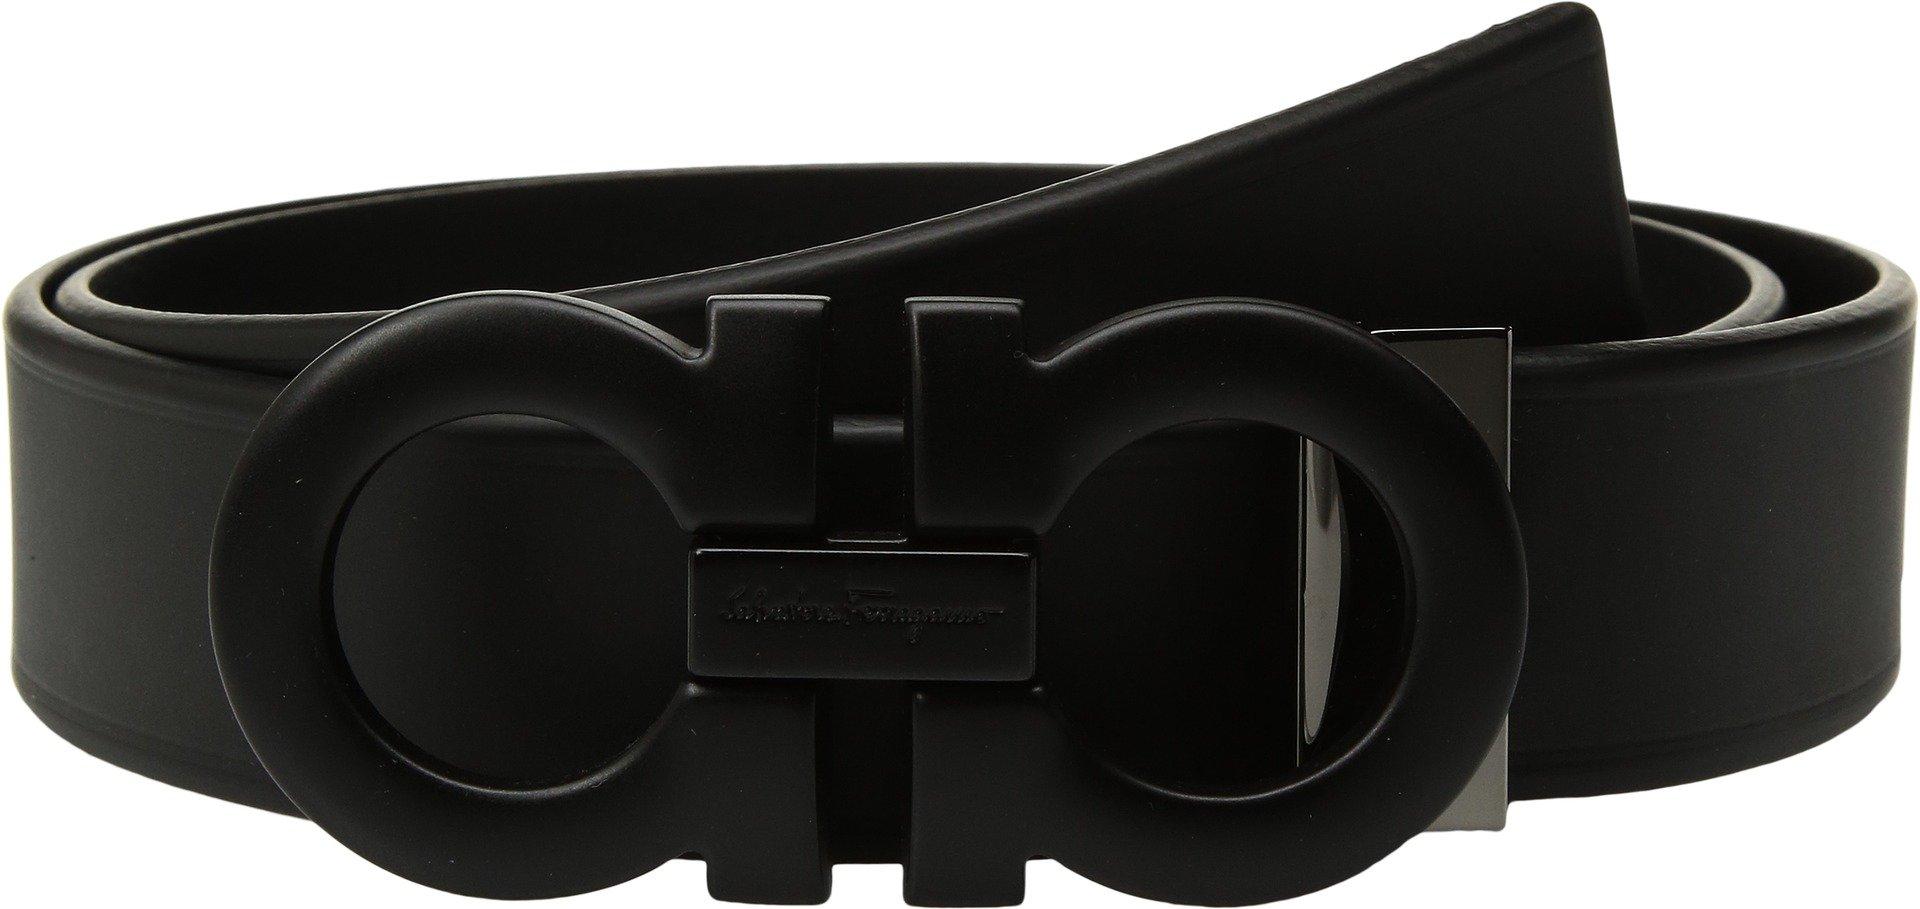 Salvatore Ferragamo  Men's Adjustable Tonal Gancini Belt - 679673 Black 36